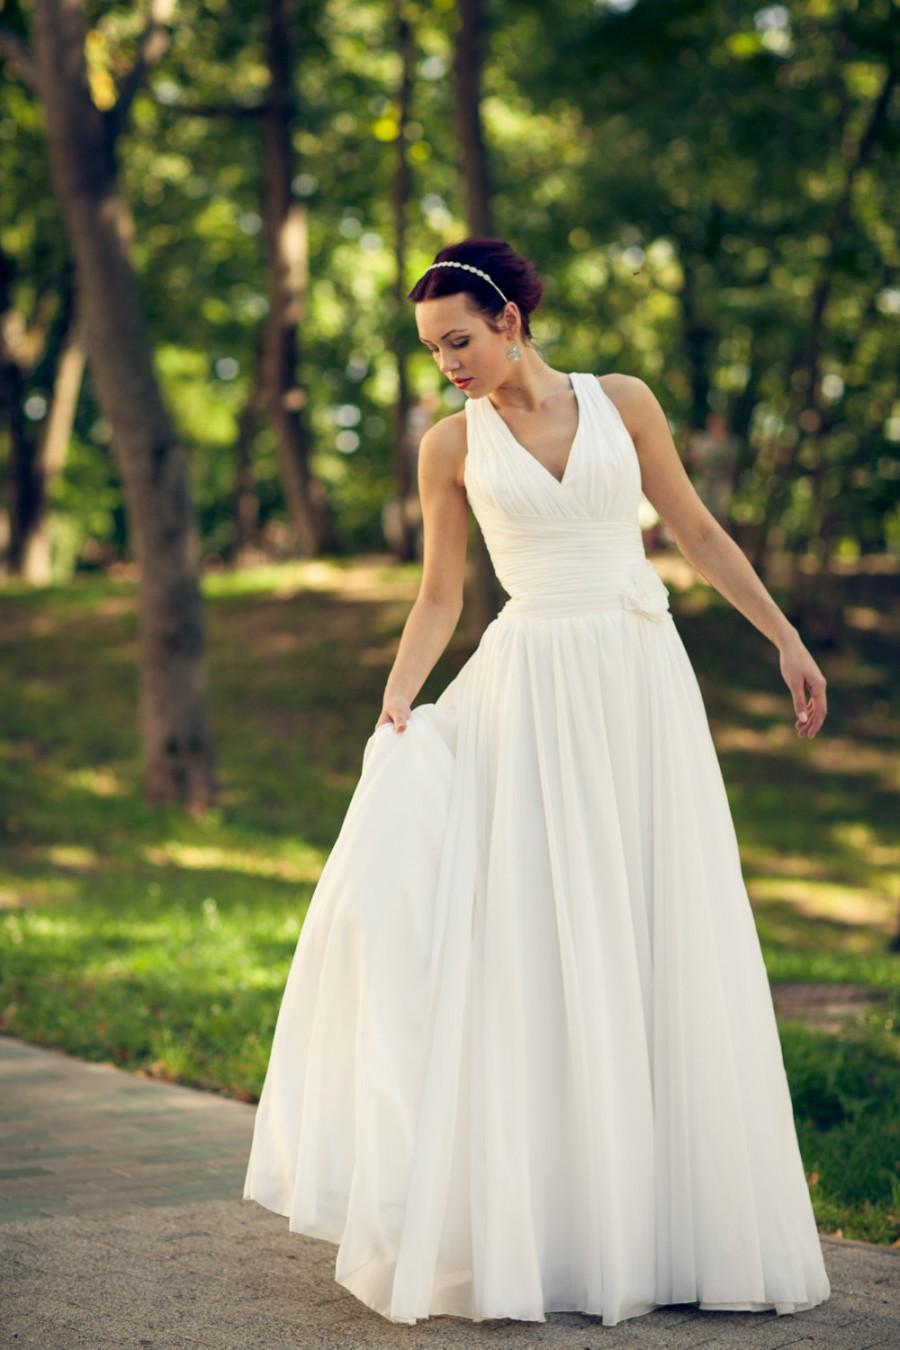 Wedding - Boho Vintage Inspired A-Line Chiffon Wedding Dress with Deep V Cutout, Draped Corset, Light-As-Air Chiffon Skirt